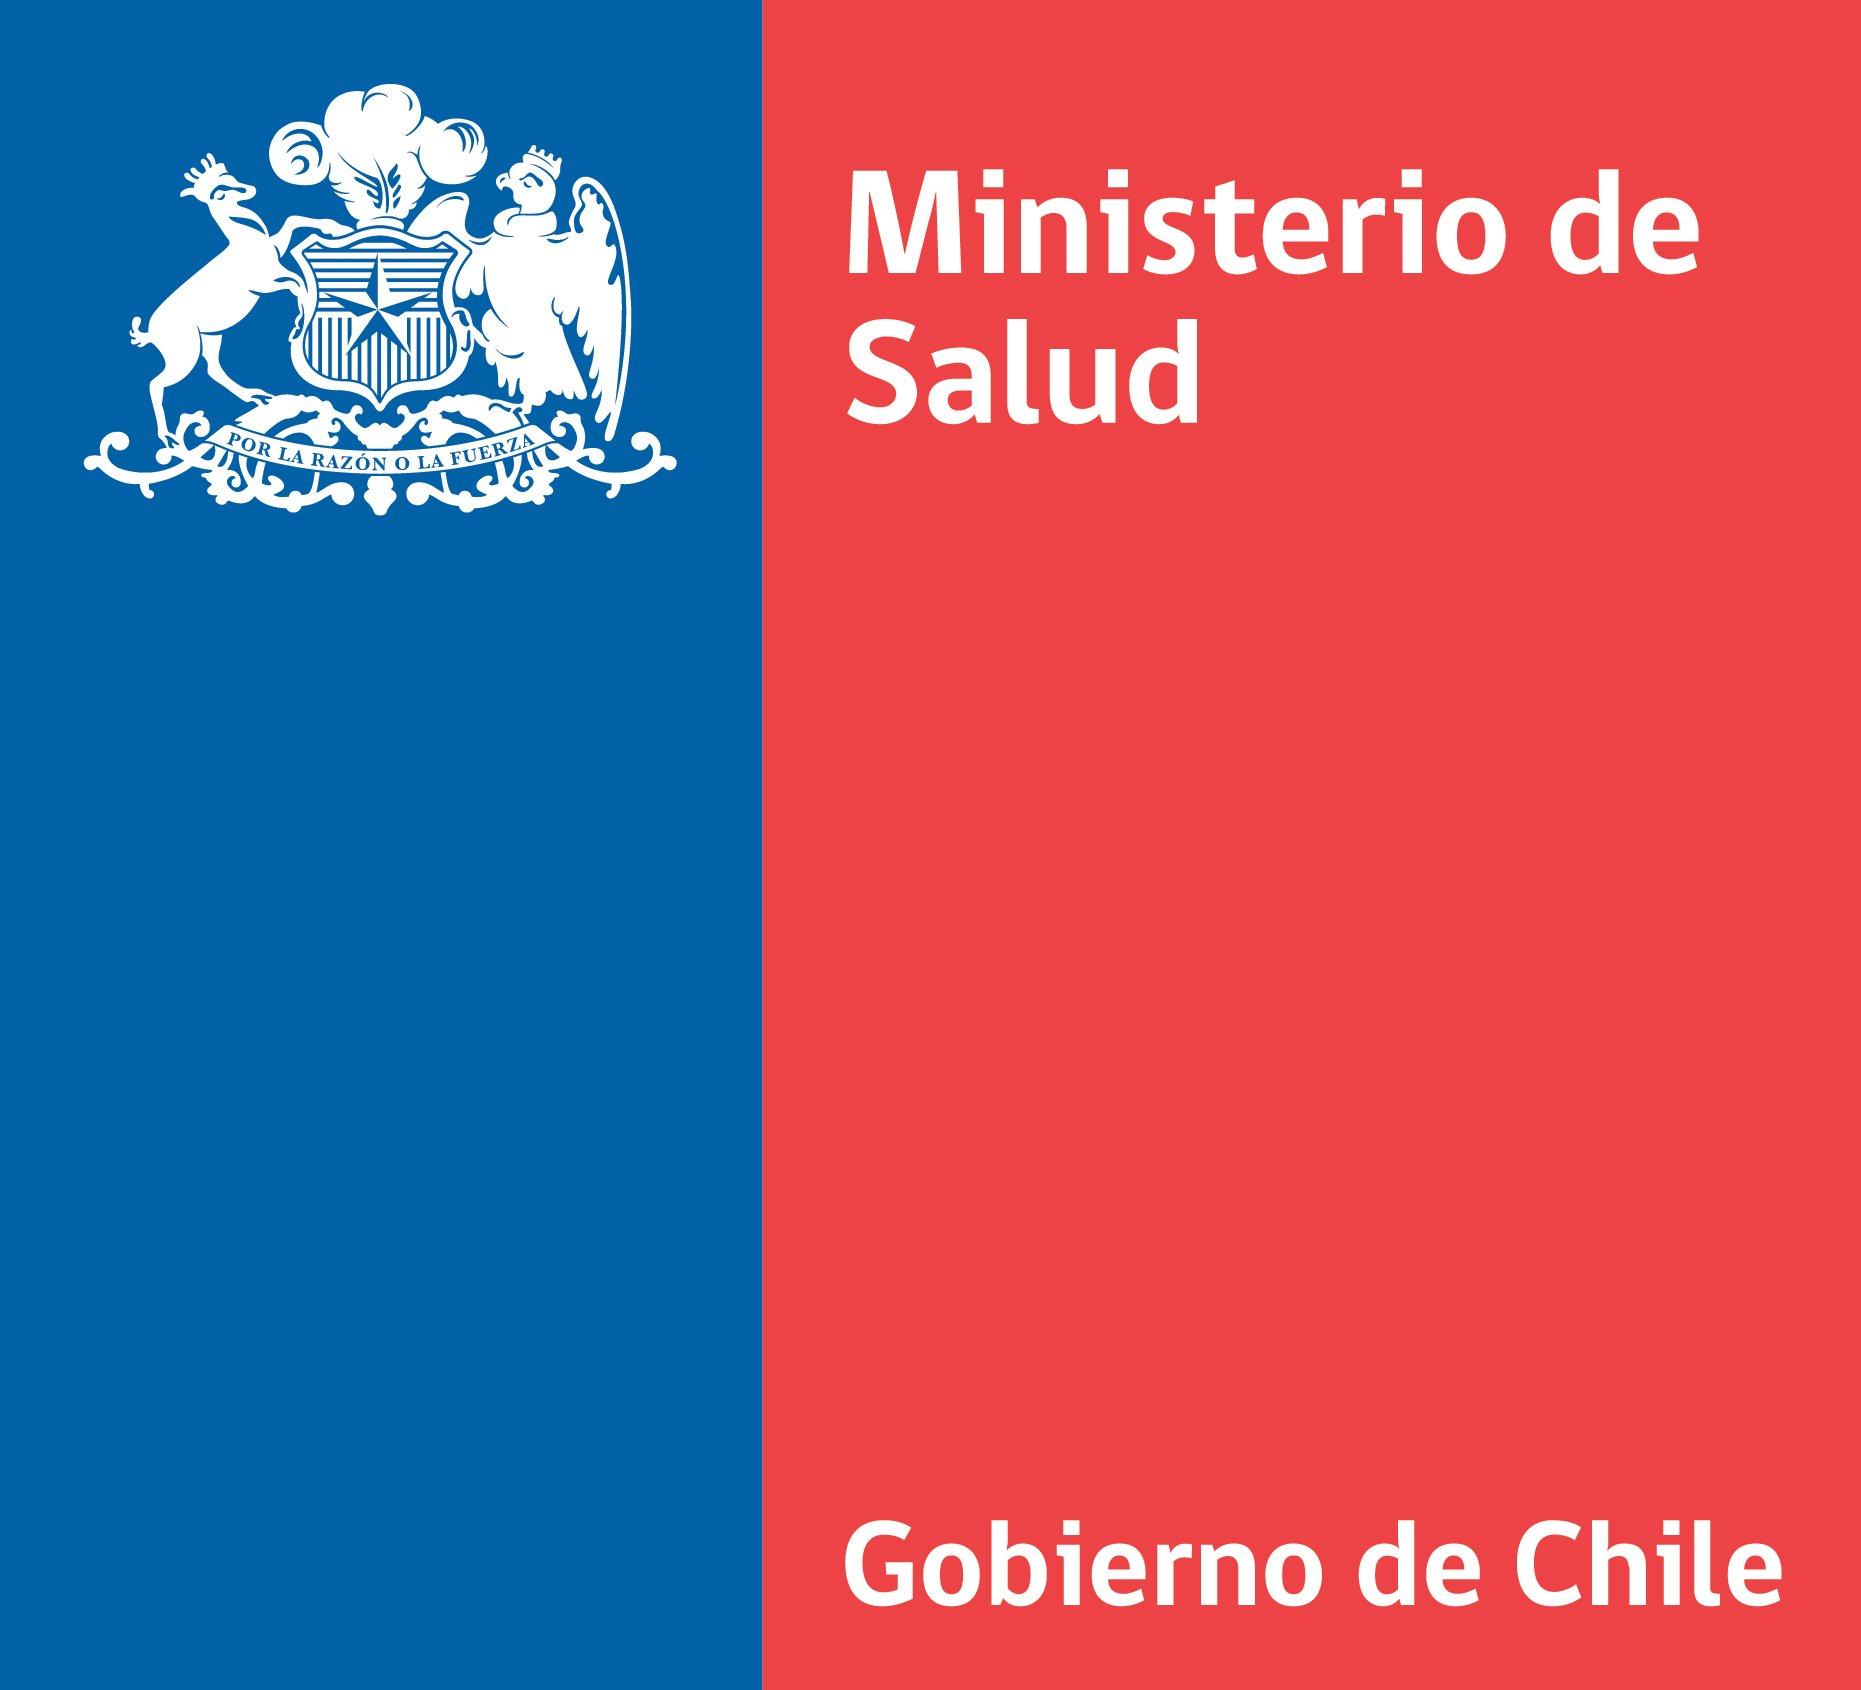 Ministerio de Salud logo